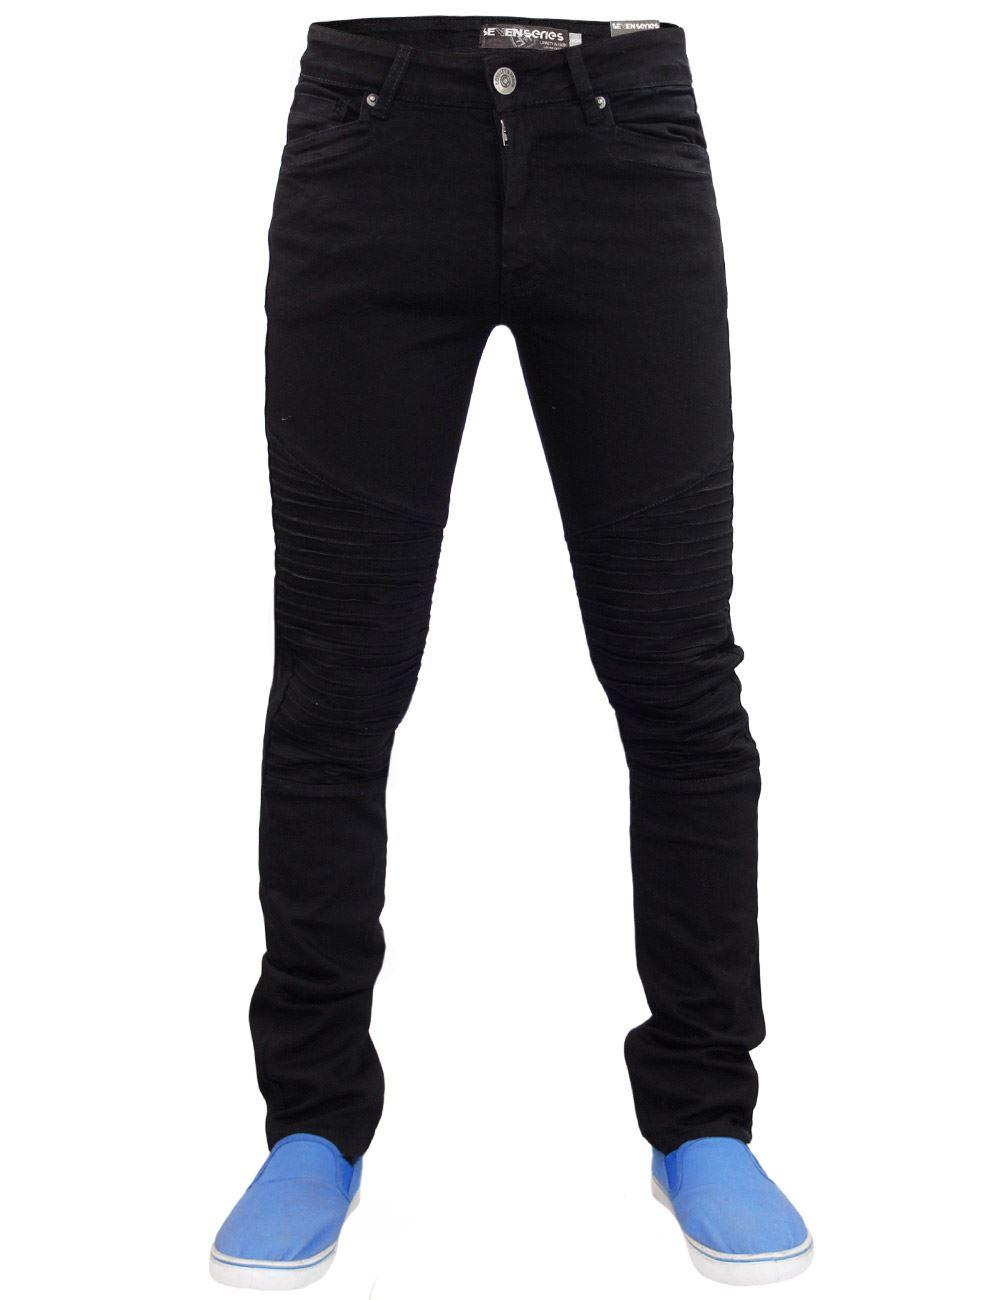 Men-Skinny-Jeans-Stretch-Slim-Fit-Zip-Fly-Denim-Biker-Pants-Trousers-Sizes-28-38 thumbnail 3